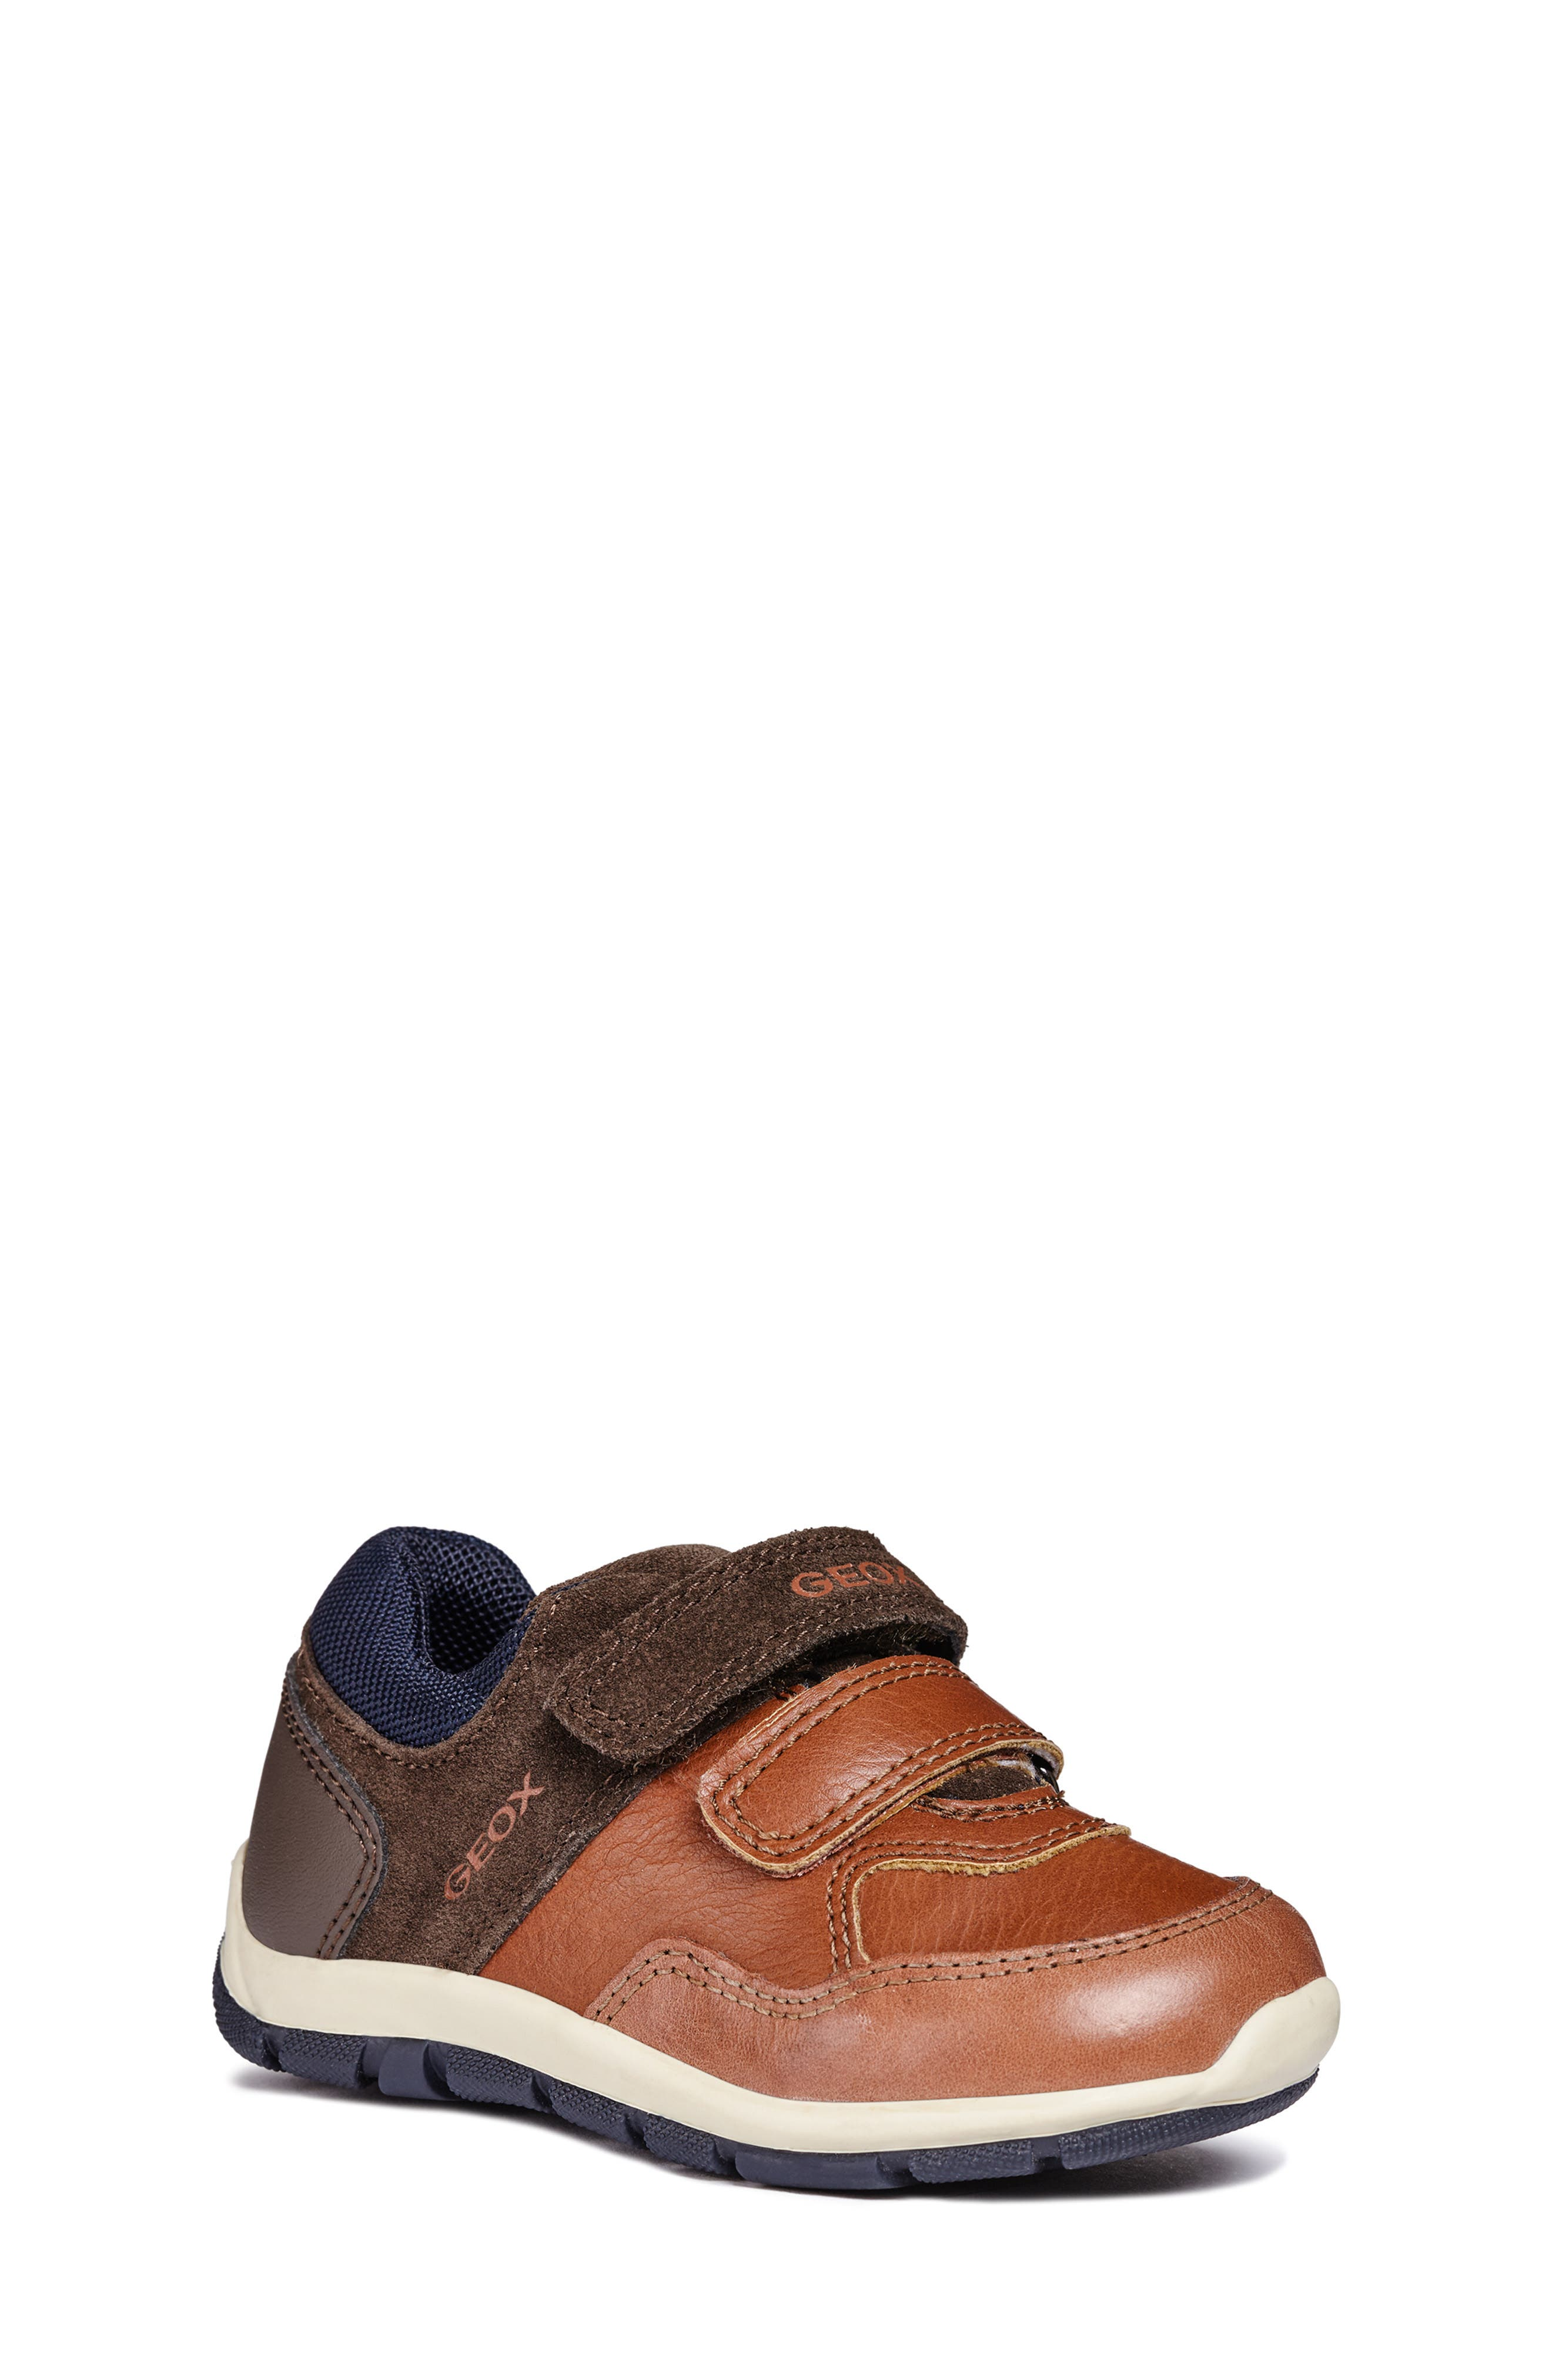 GEOX Shaax Sneaker, Main, color, 200